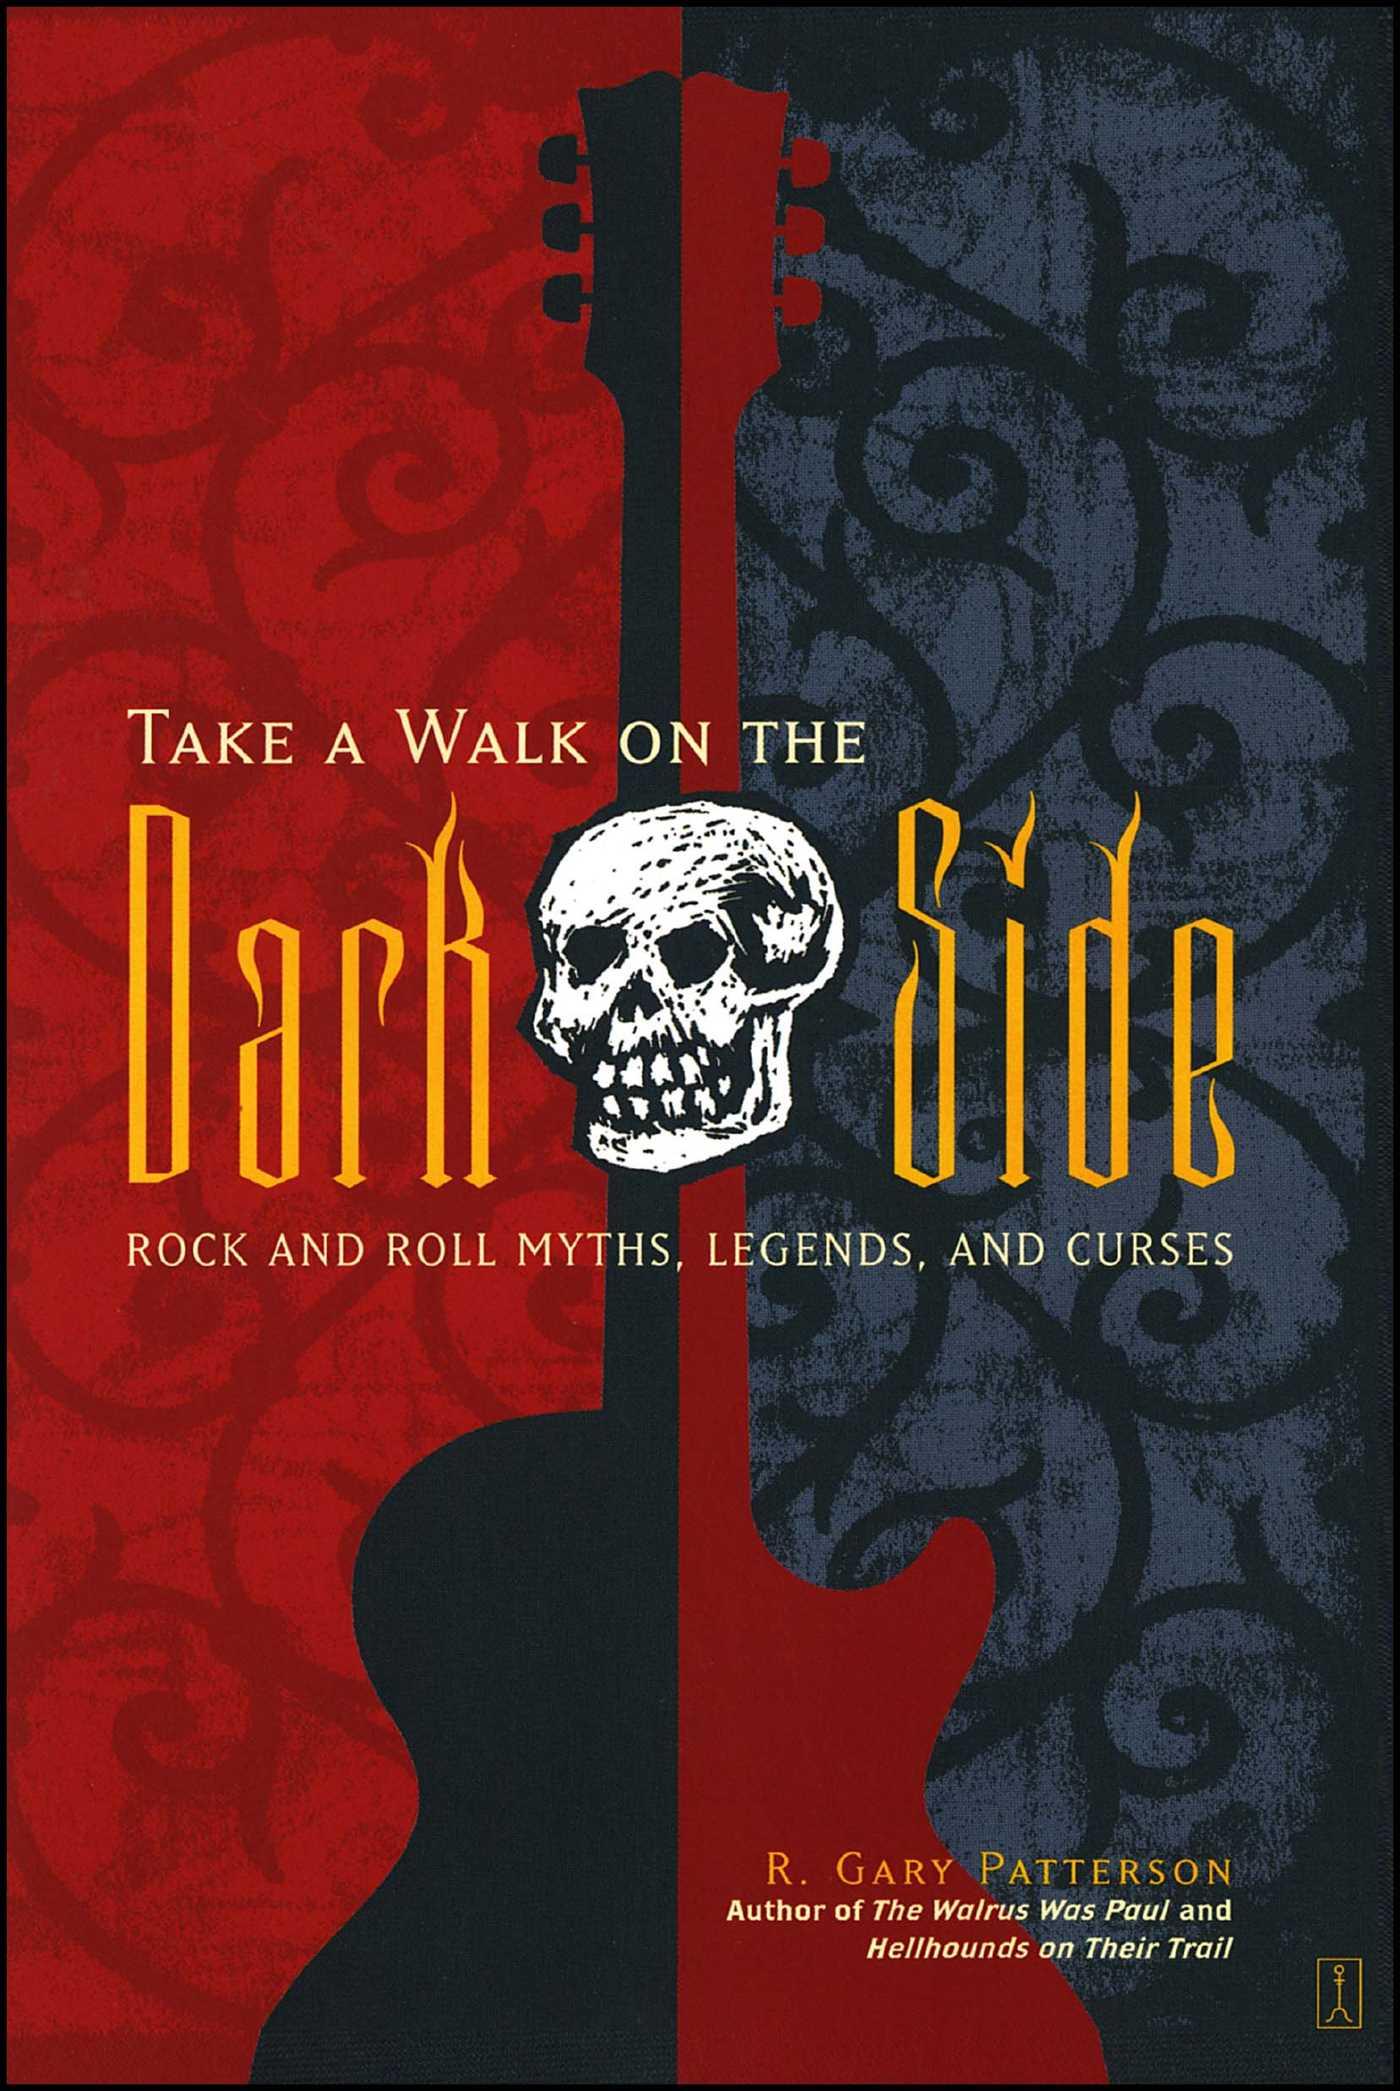 Take a walk on the dark side 9780743244237 hr